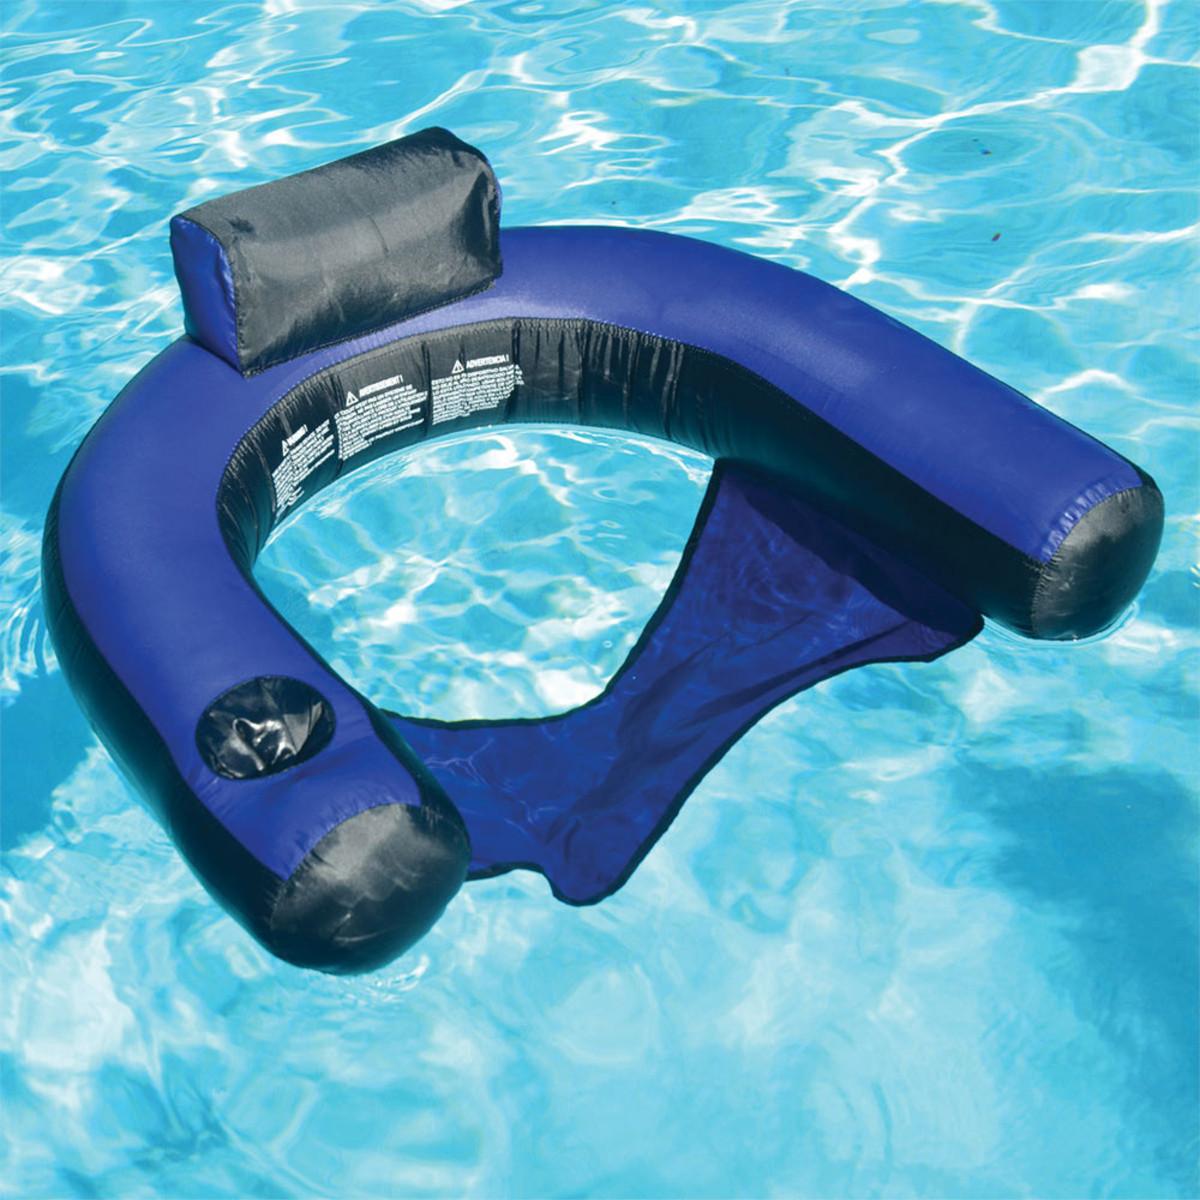 Swimline Pool Floats Amp Lounges Combo Pack Splash Super